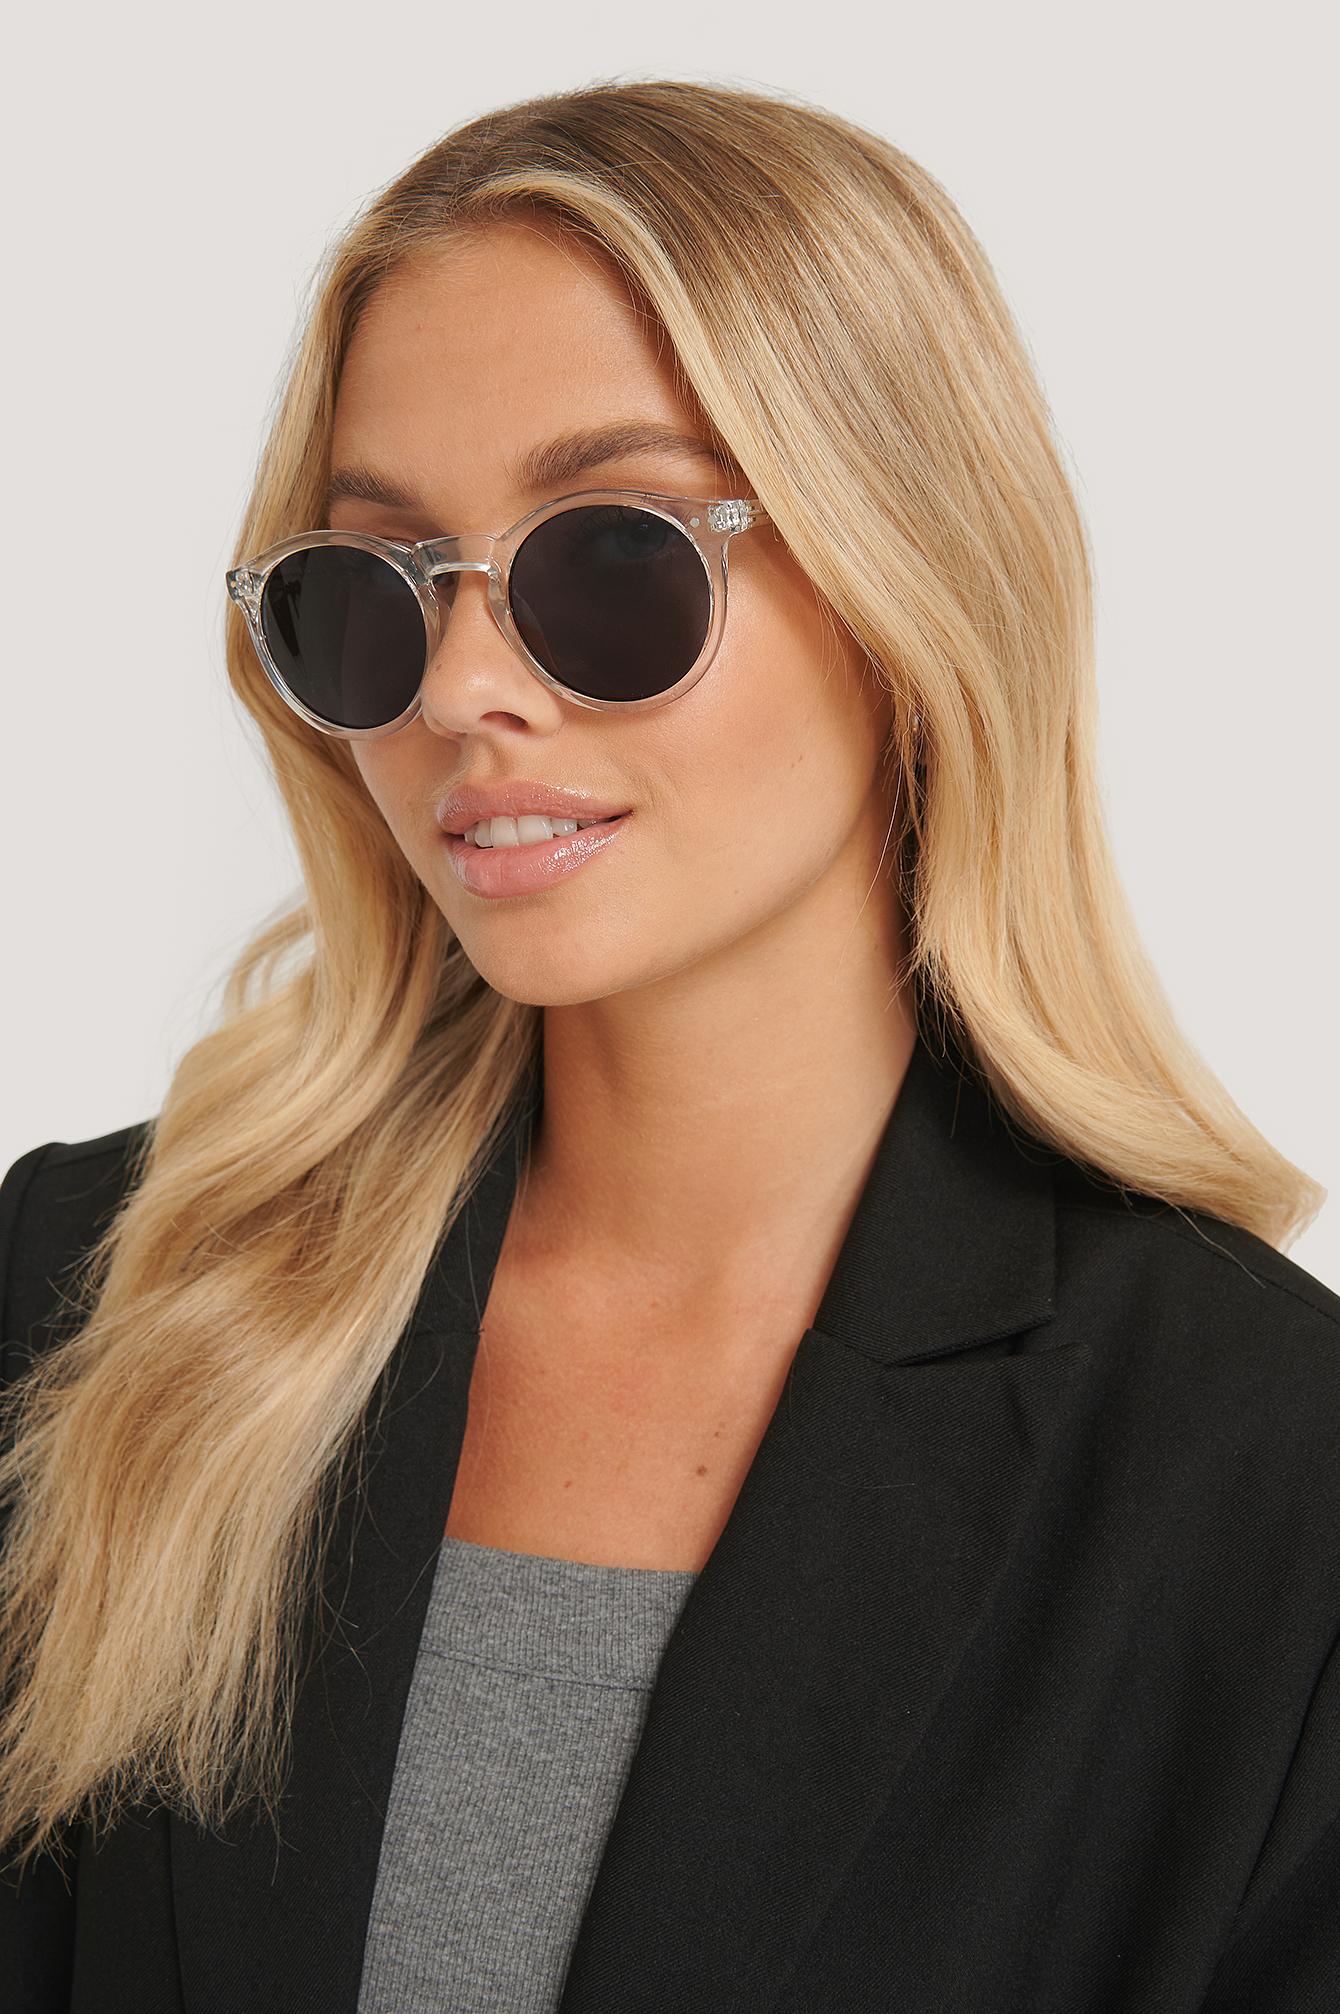 corlin eyewear -  Novara Sunglasses - White